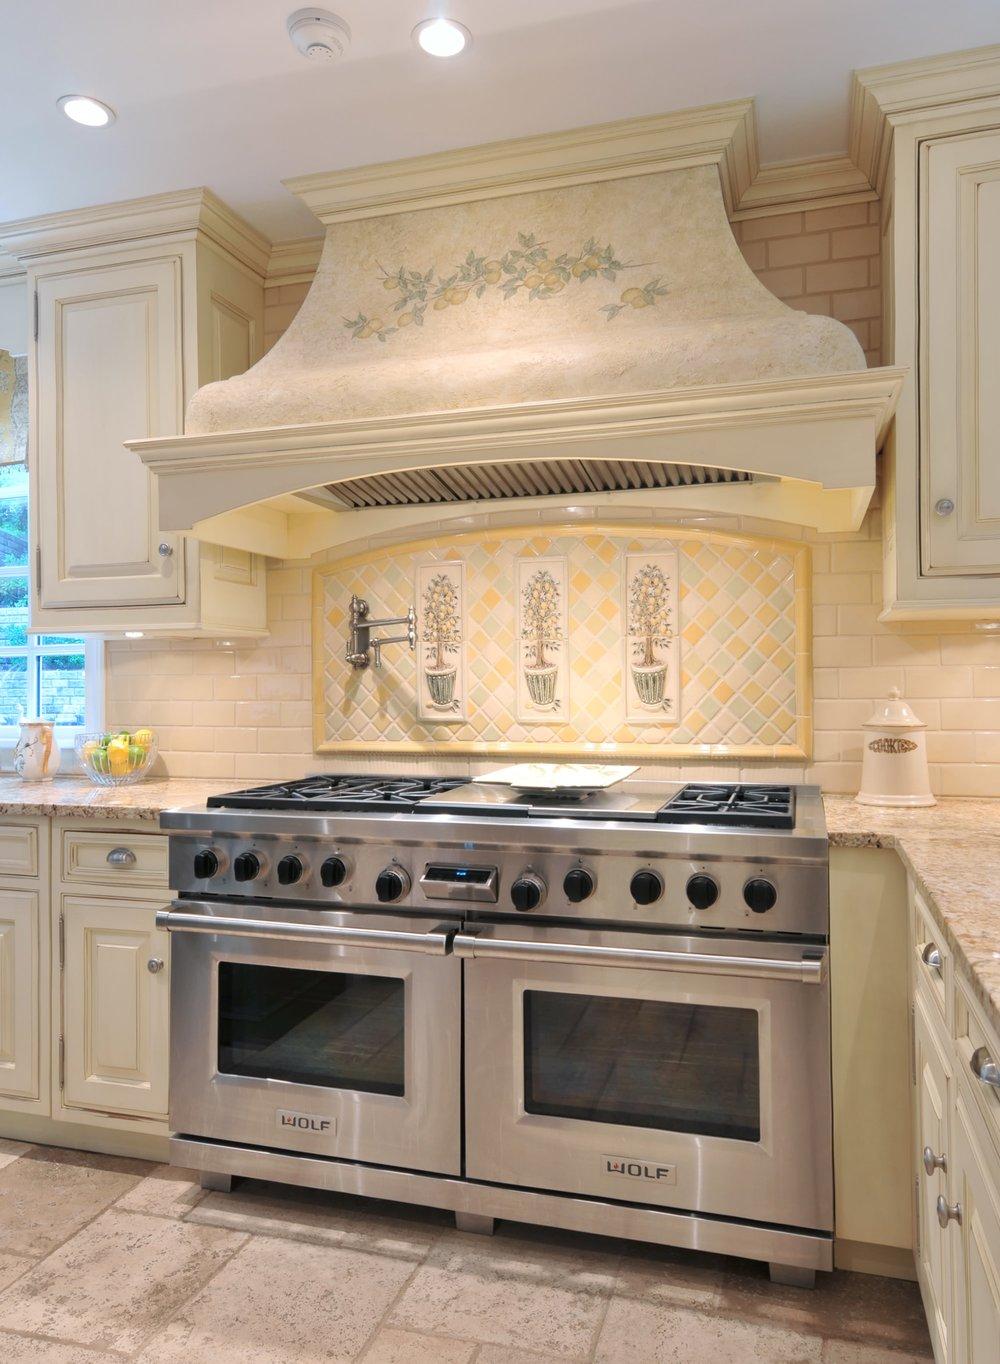 Traditional style kitchen with fashionably designed range hood